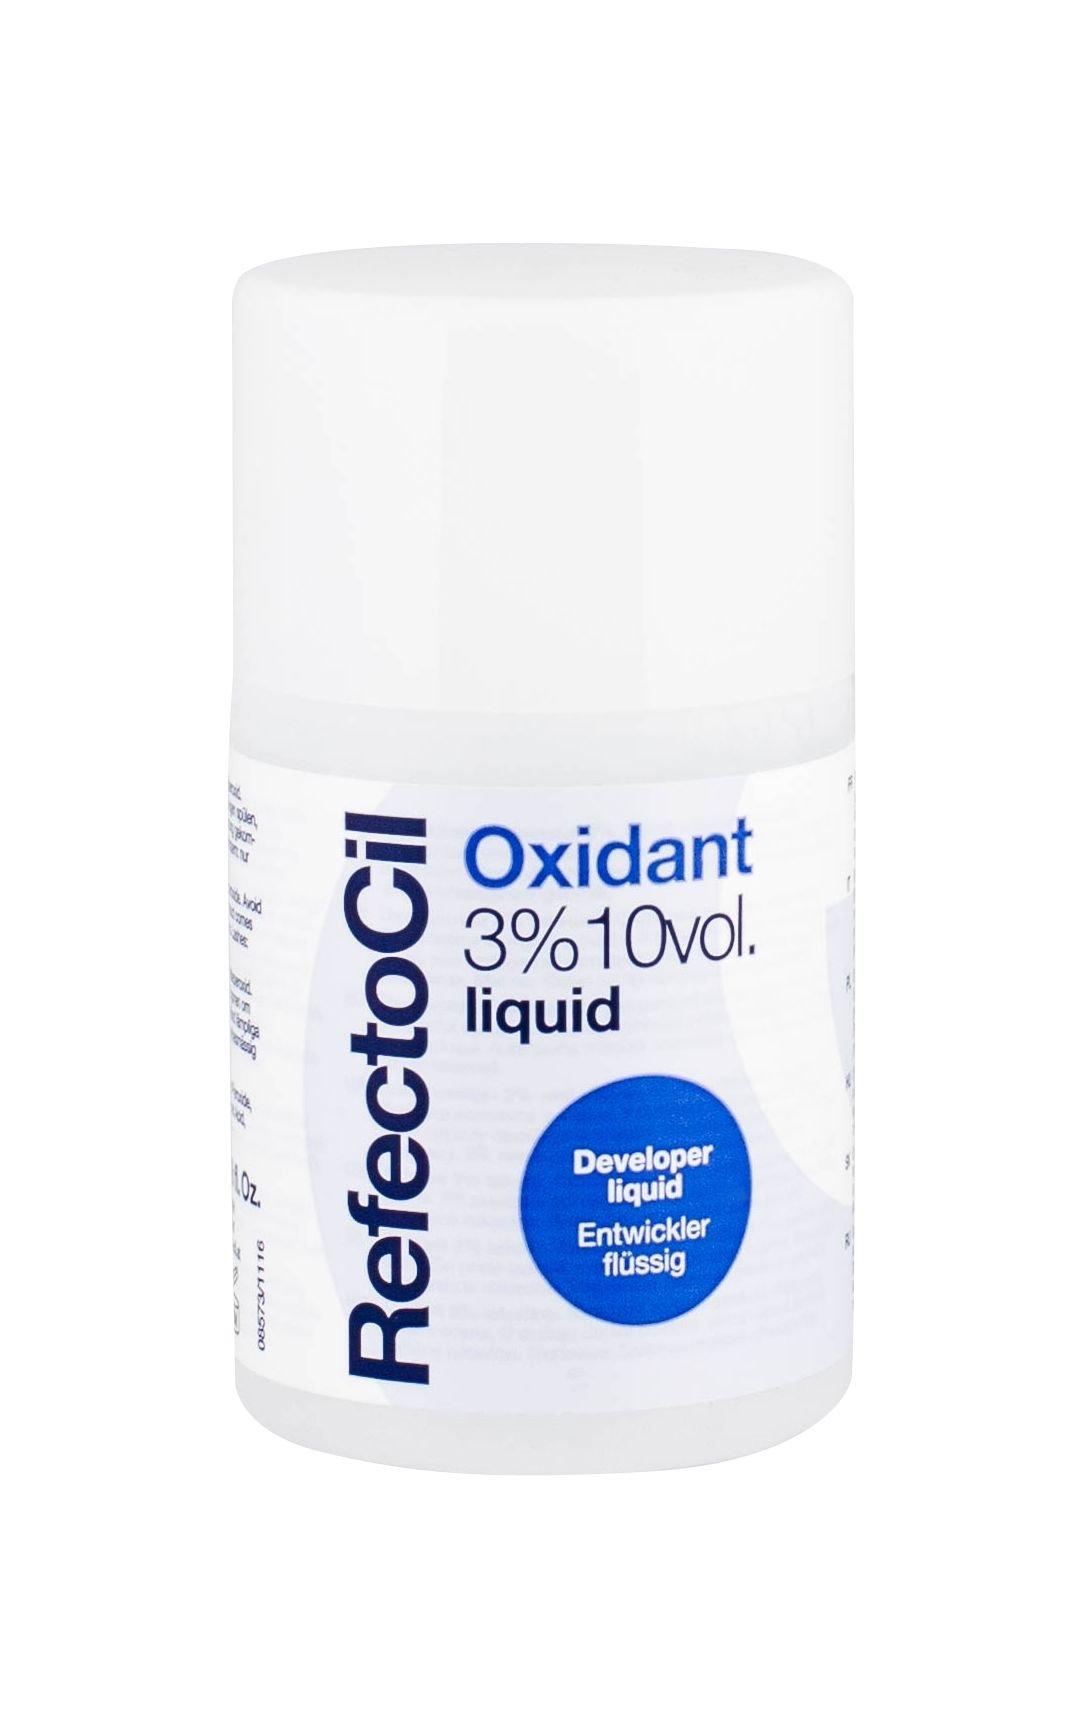 RefectoCil Oxidant Eyelashes Care 100ml